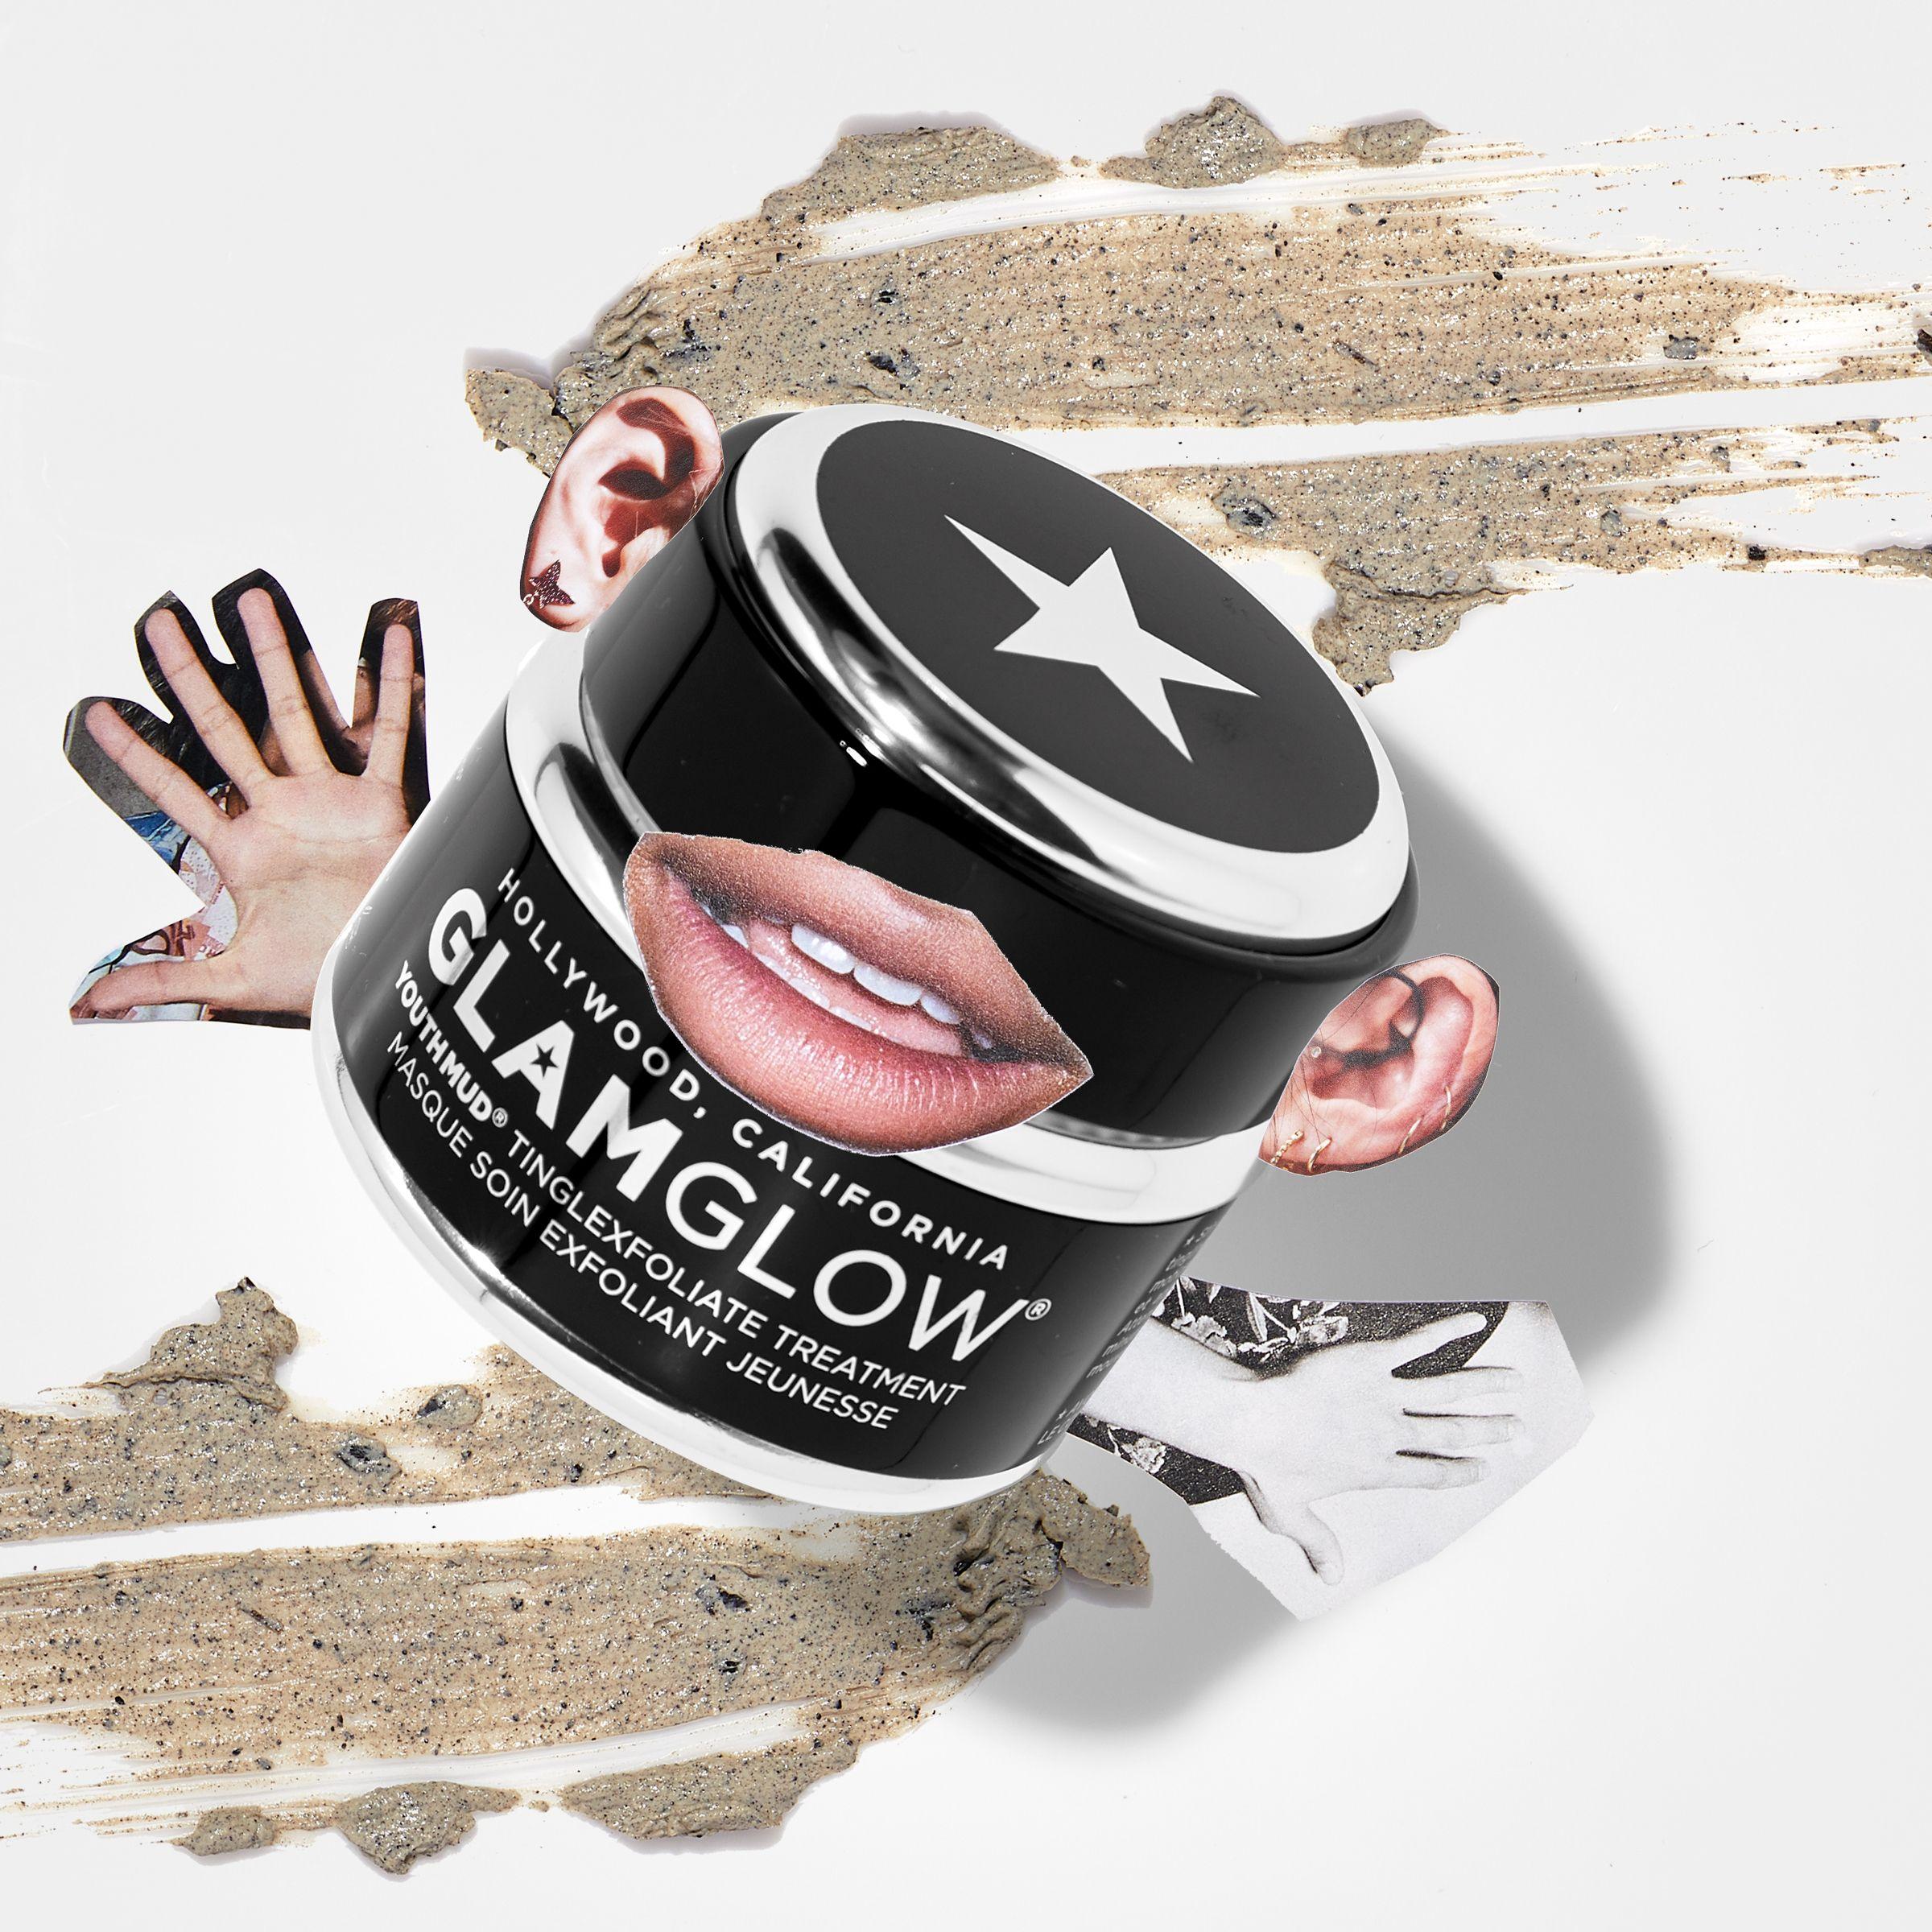 Homepage Glowing skin, Skin care